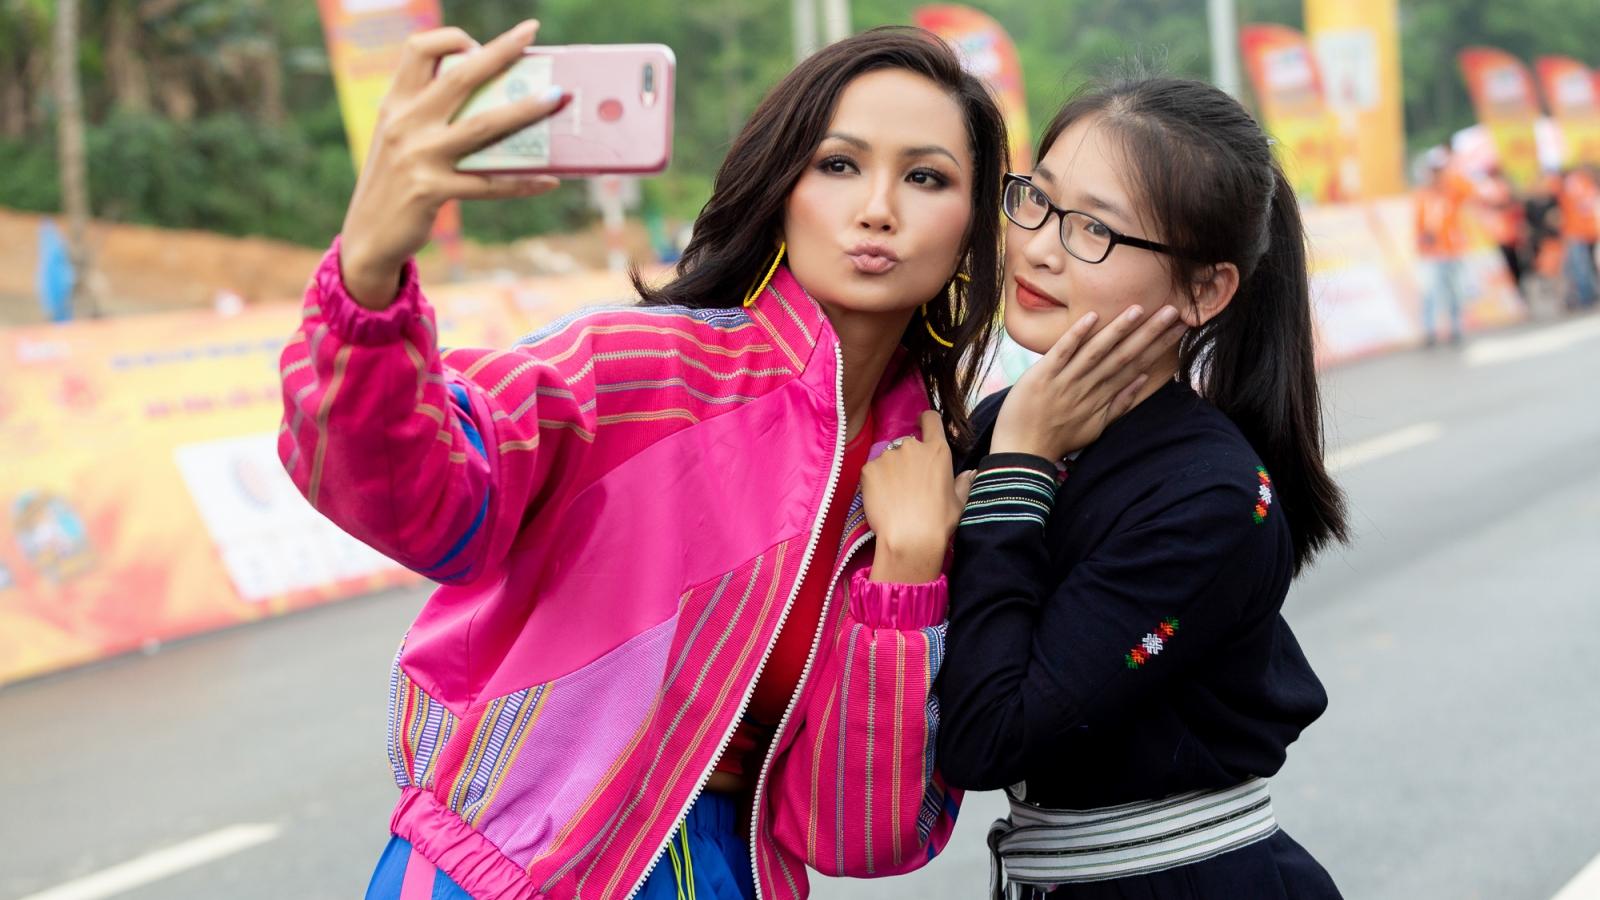 Hoa hậu H'Hen Niê diện crop top khéo khoe vòng eo 59